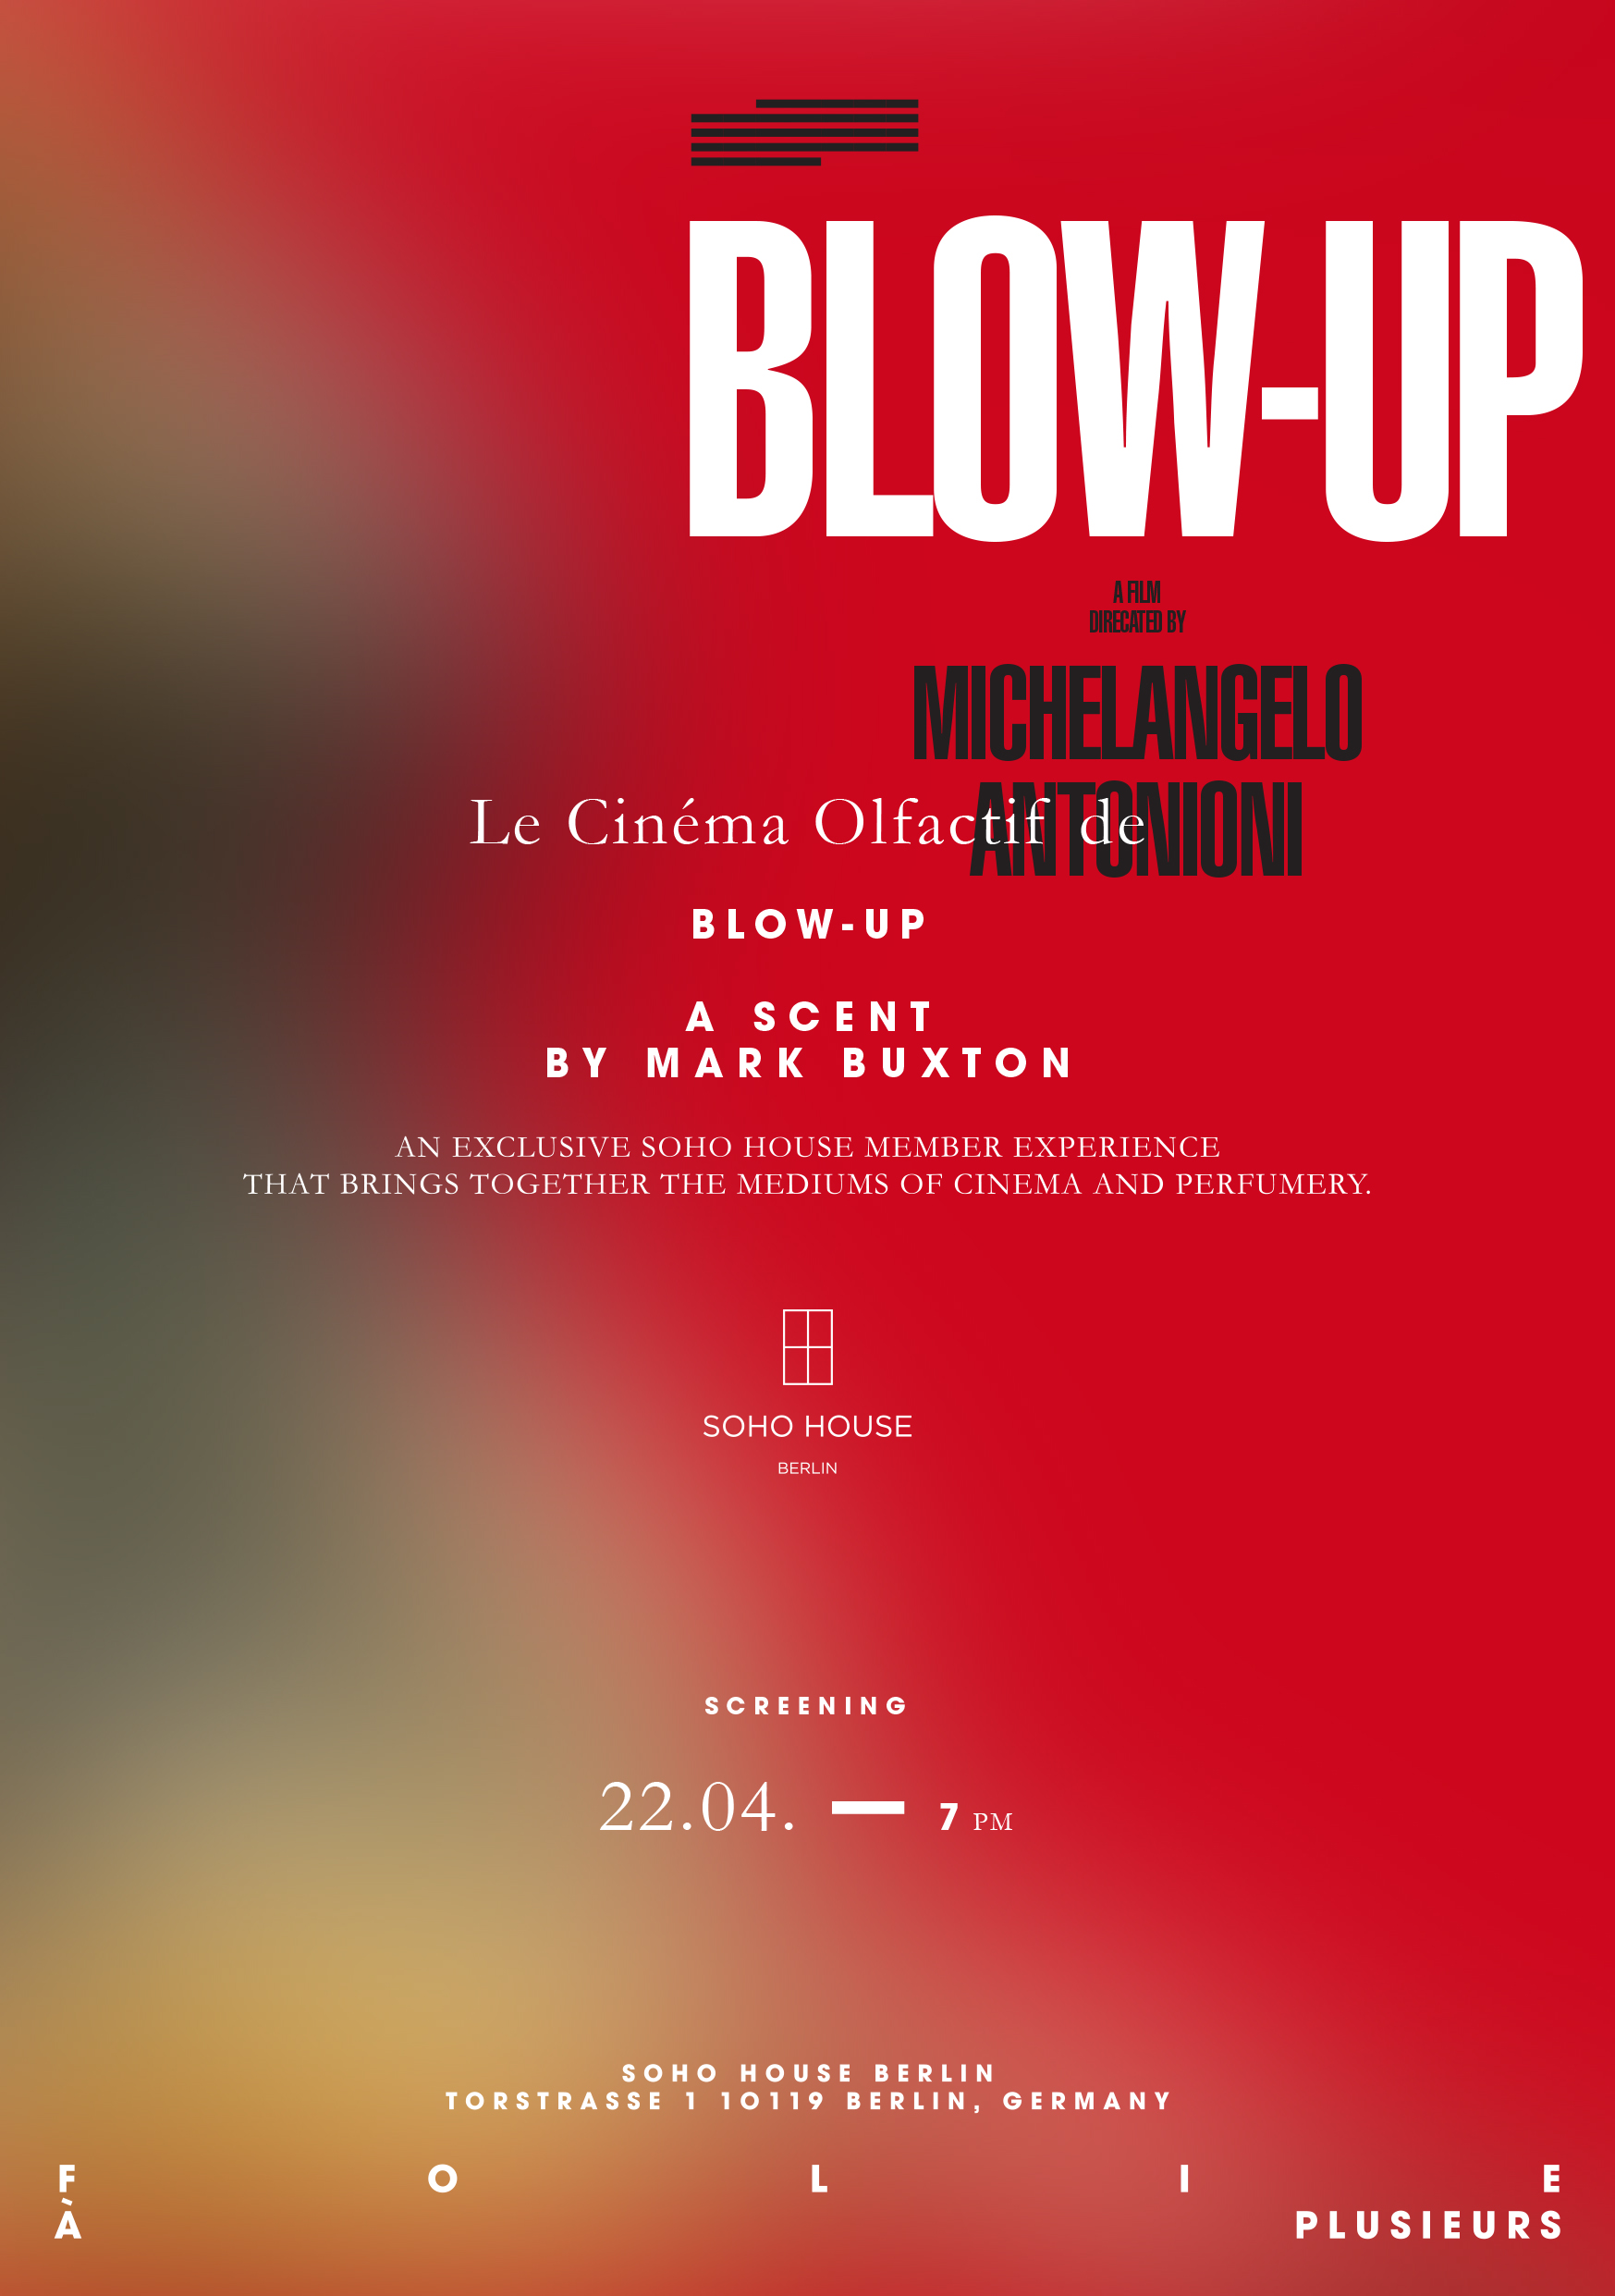 Blow-Up-Fragrance_Folie-A-Plusieurs.jpg